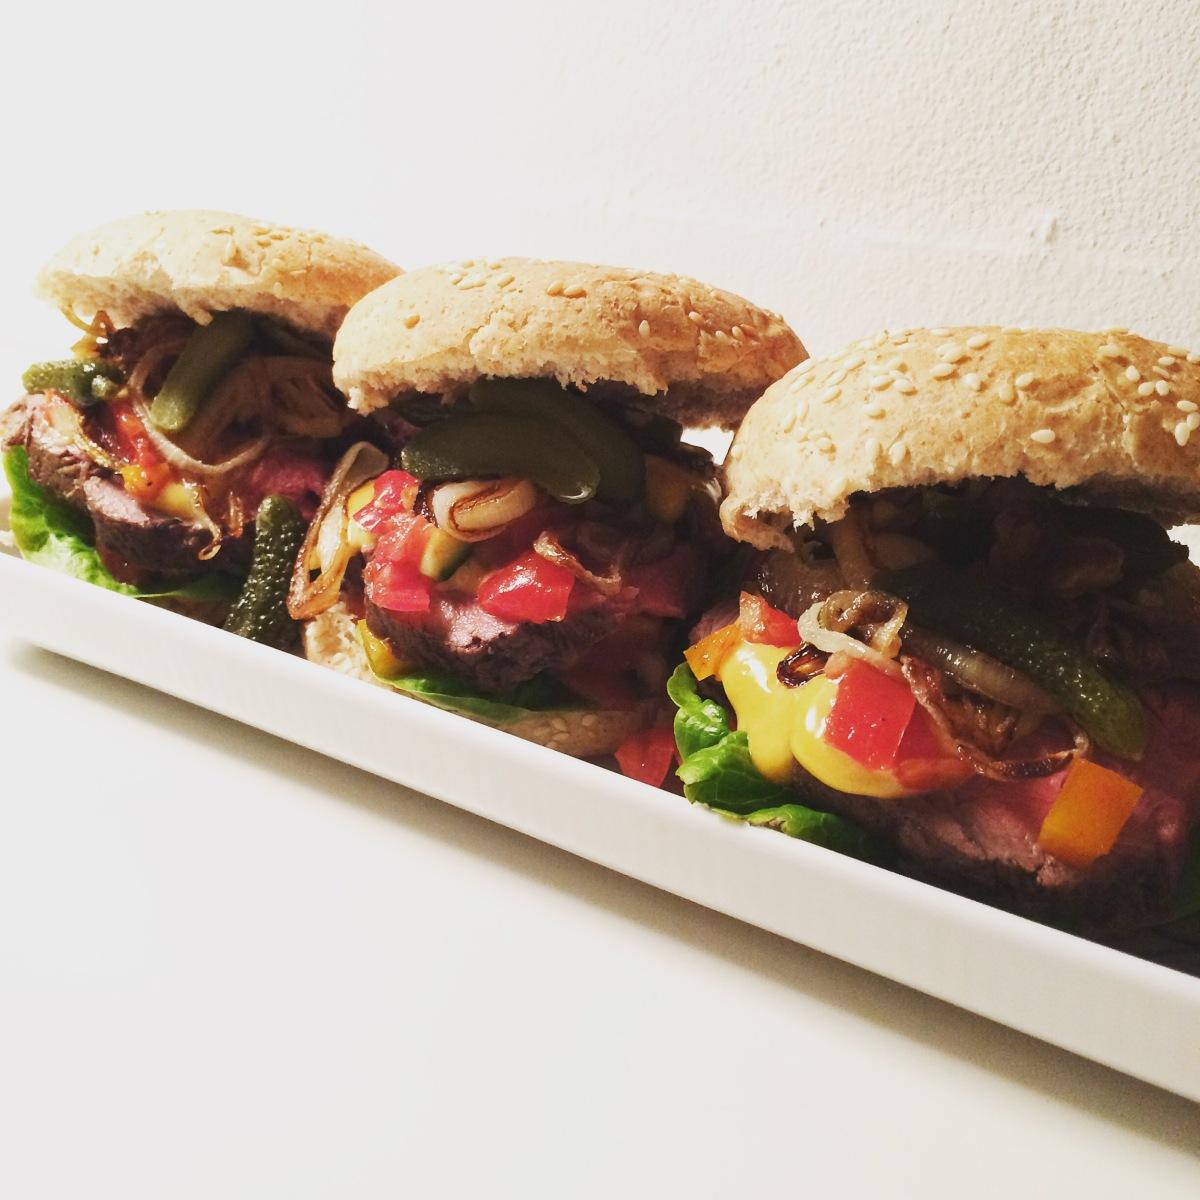 Gourmet burger med oksemørbrad og hjemmerørt chilimayo